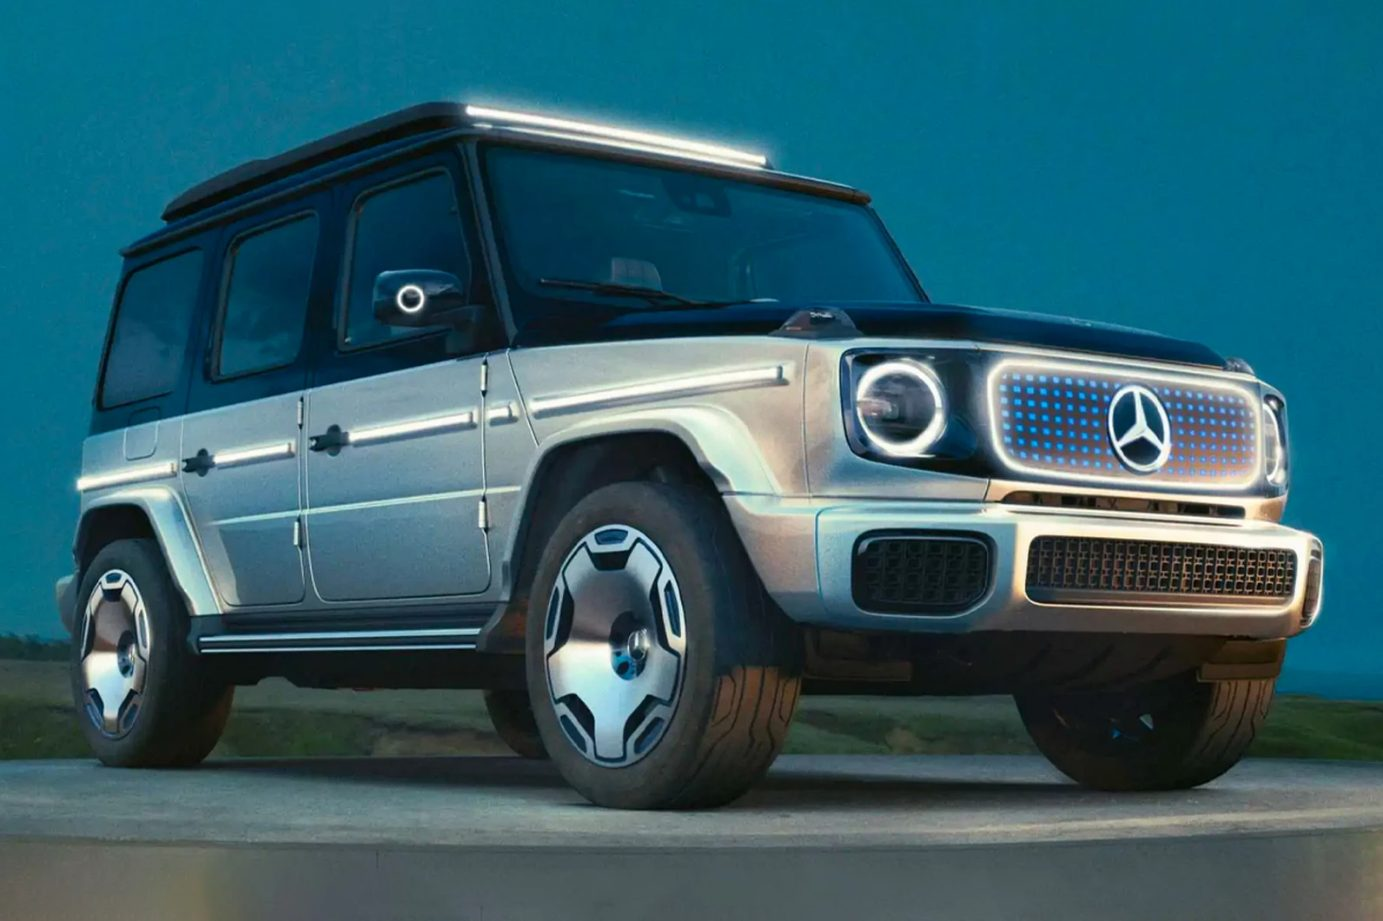 Mercedes Classe G Concept EQG